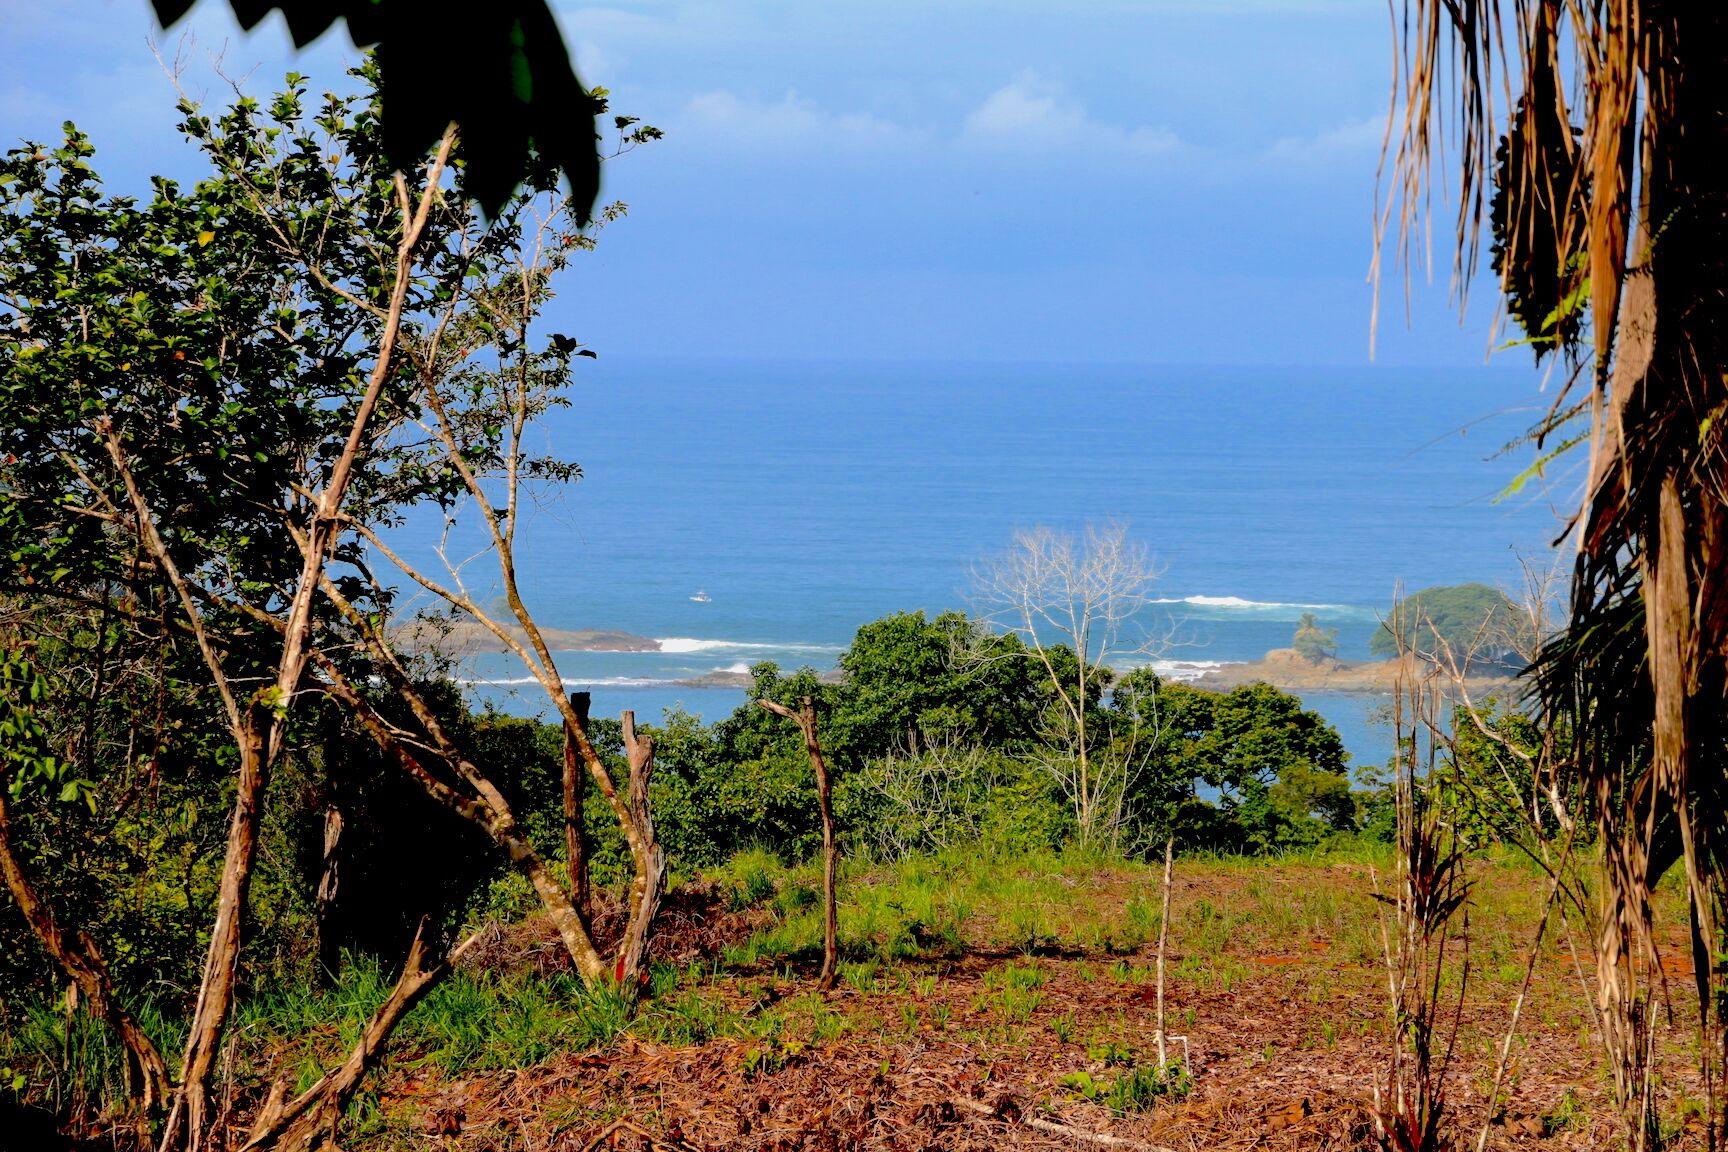 Dominical-Costa-Rica-property-costaricarealestateDOM335-10.jpeg